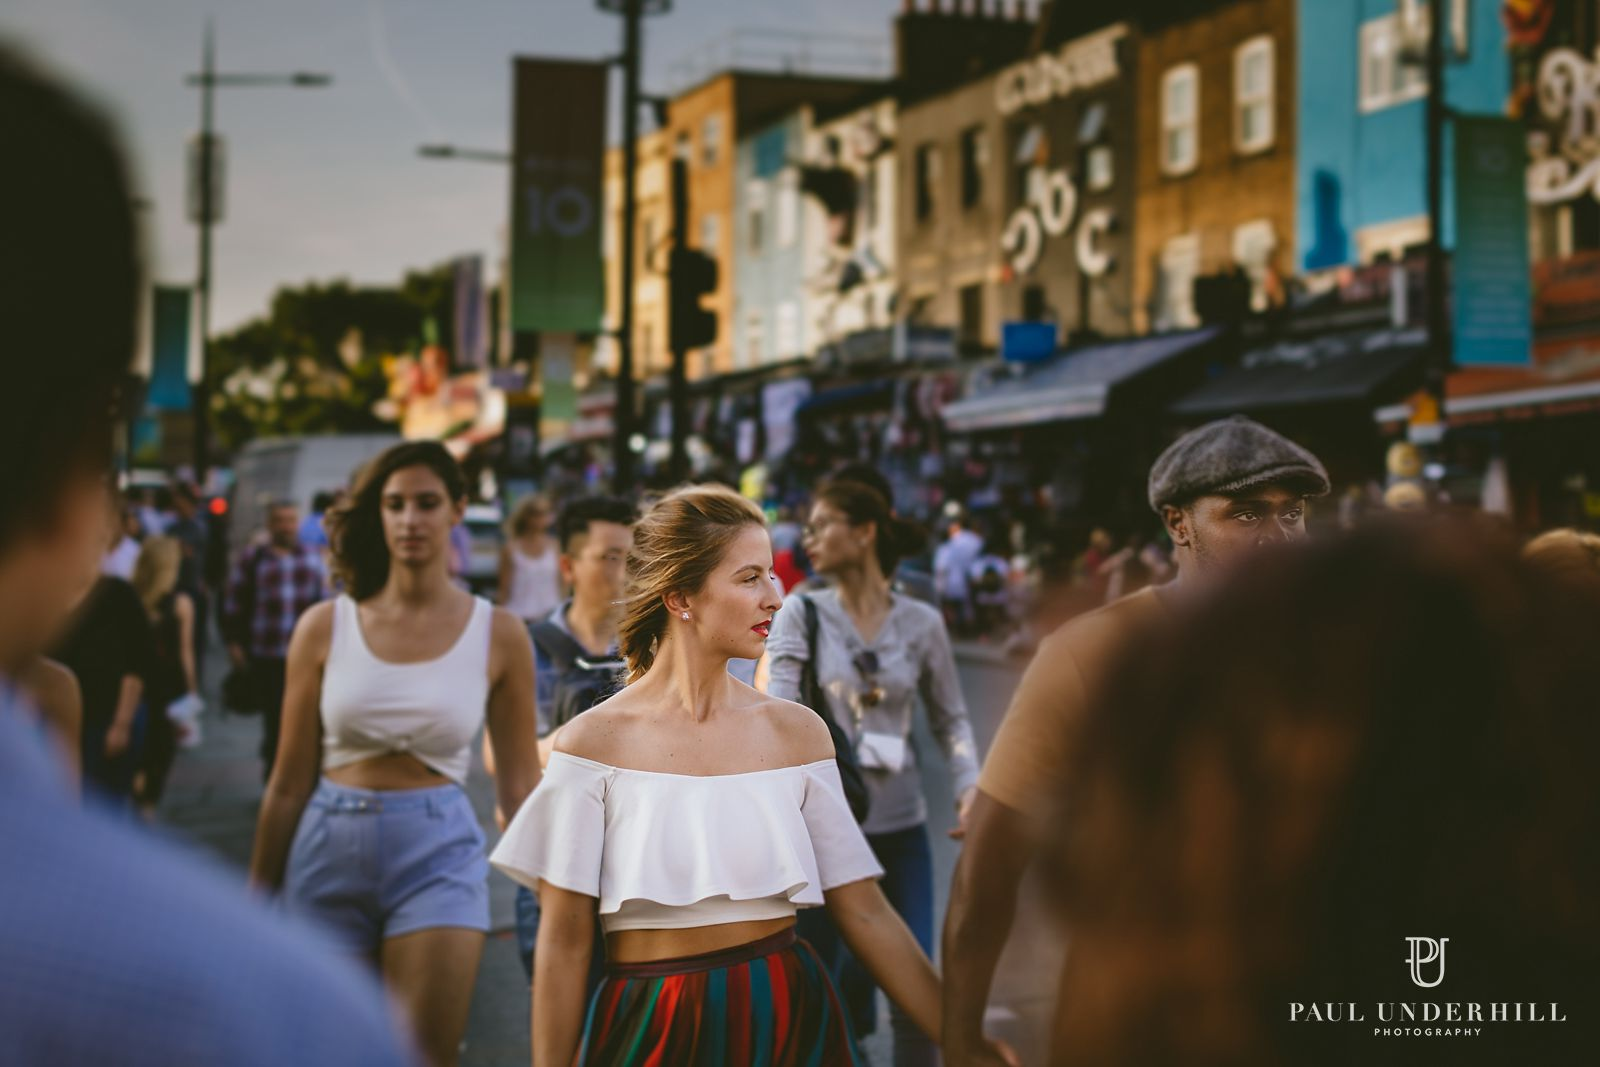 creative-lifestyle-portraits-london